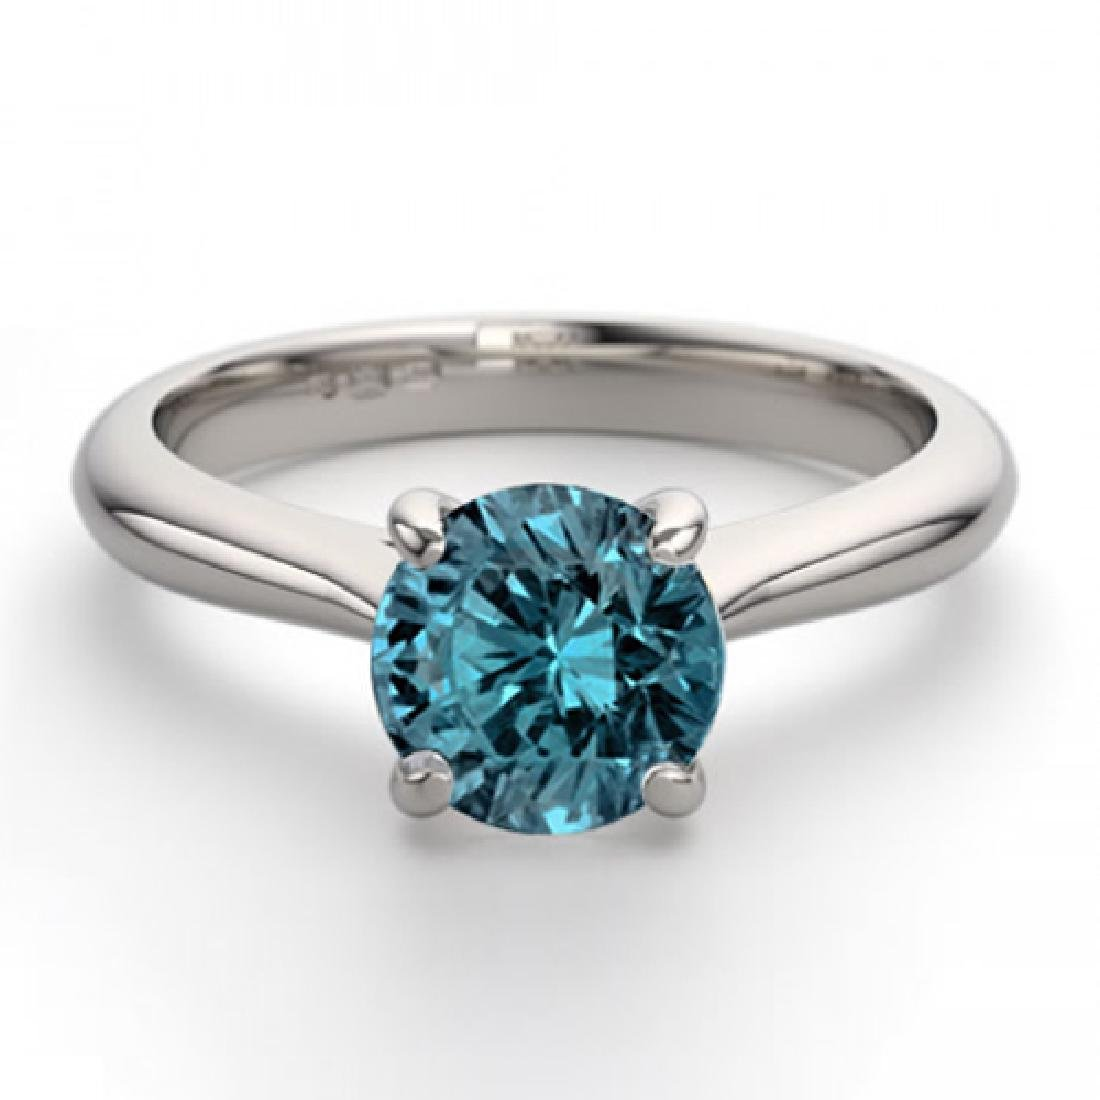 14K White Gold 1.24 ctw Blue Diamond Solitaire Ring -